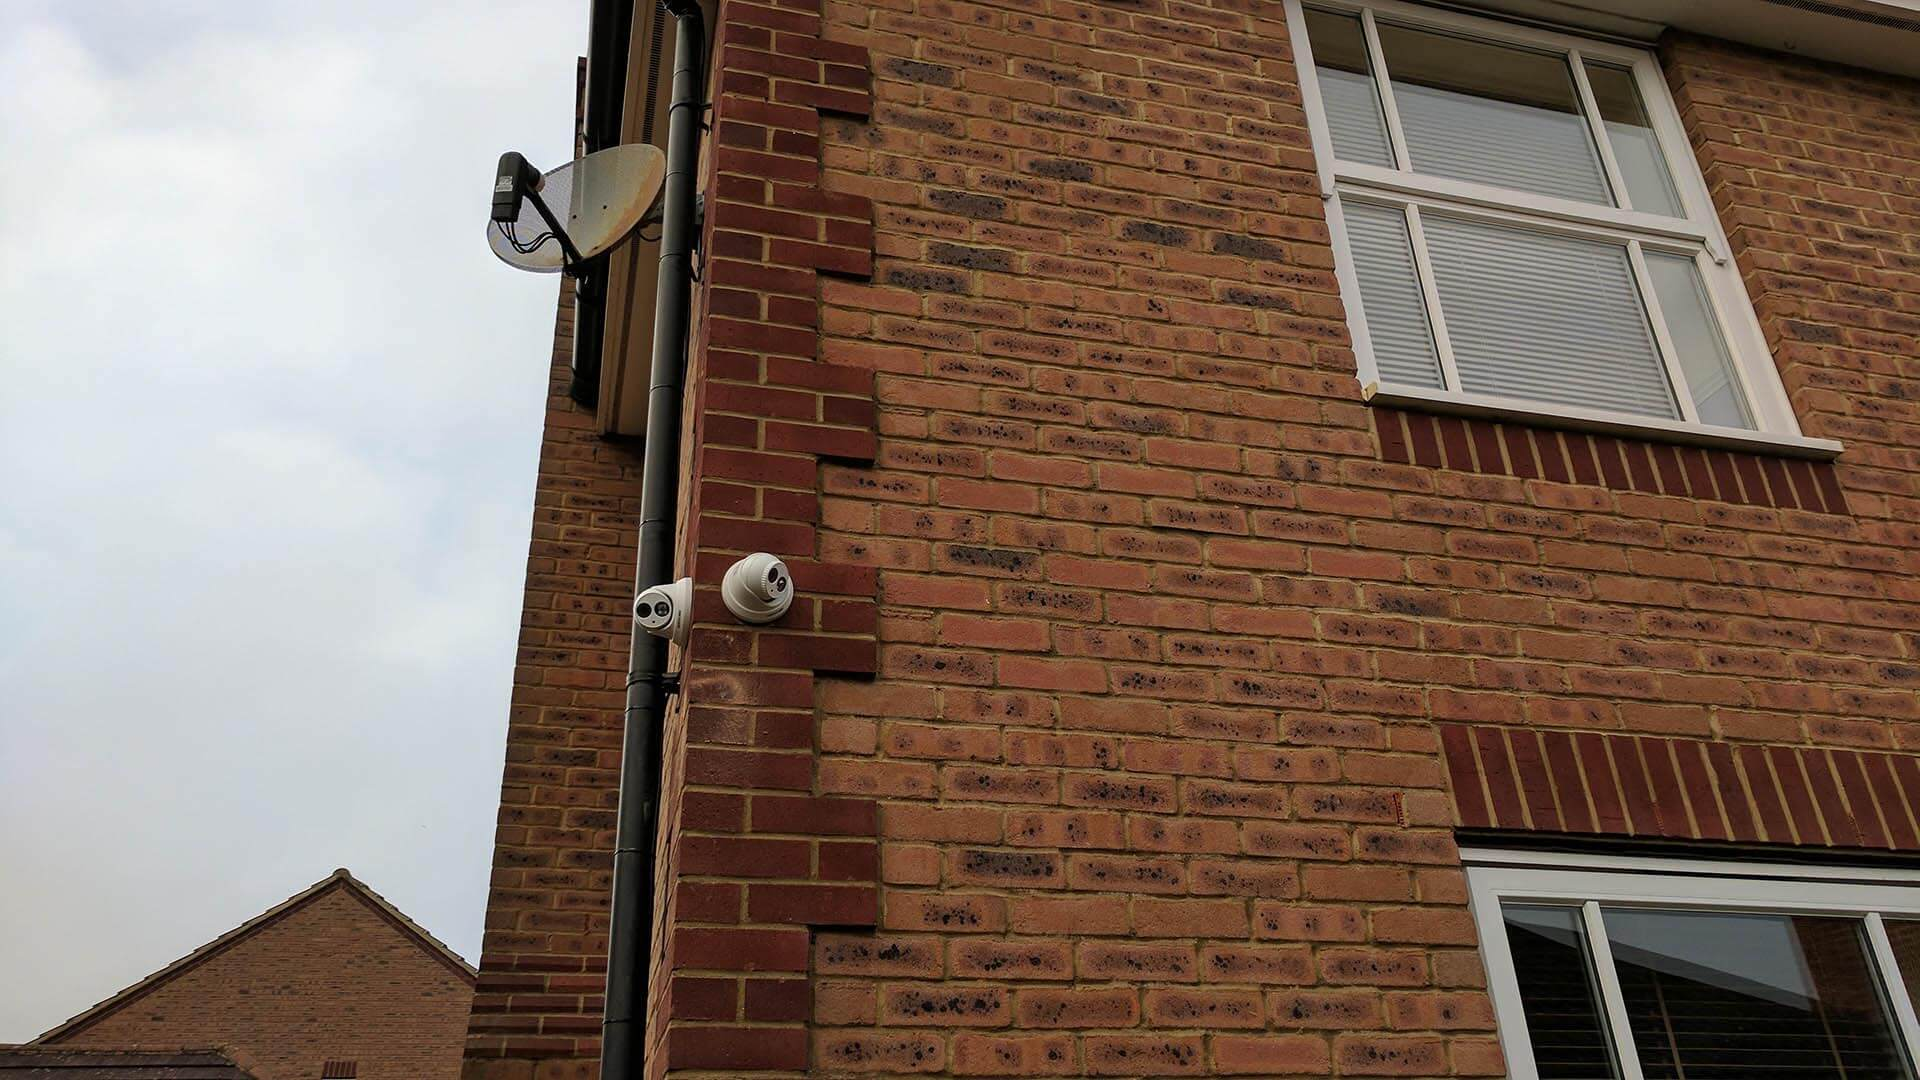 CCTV Installation in Tattenhoe